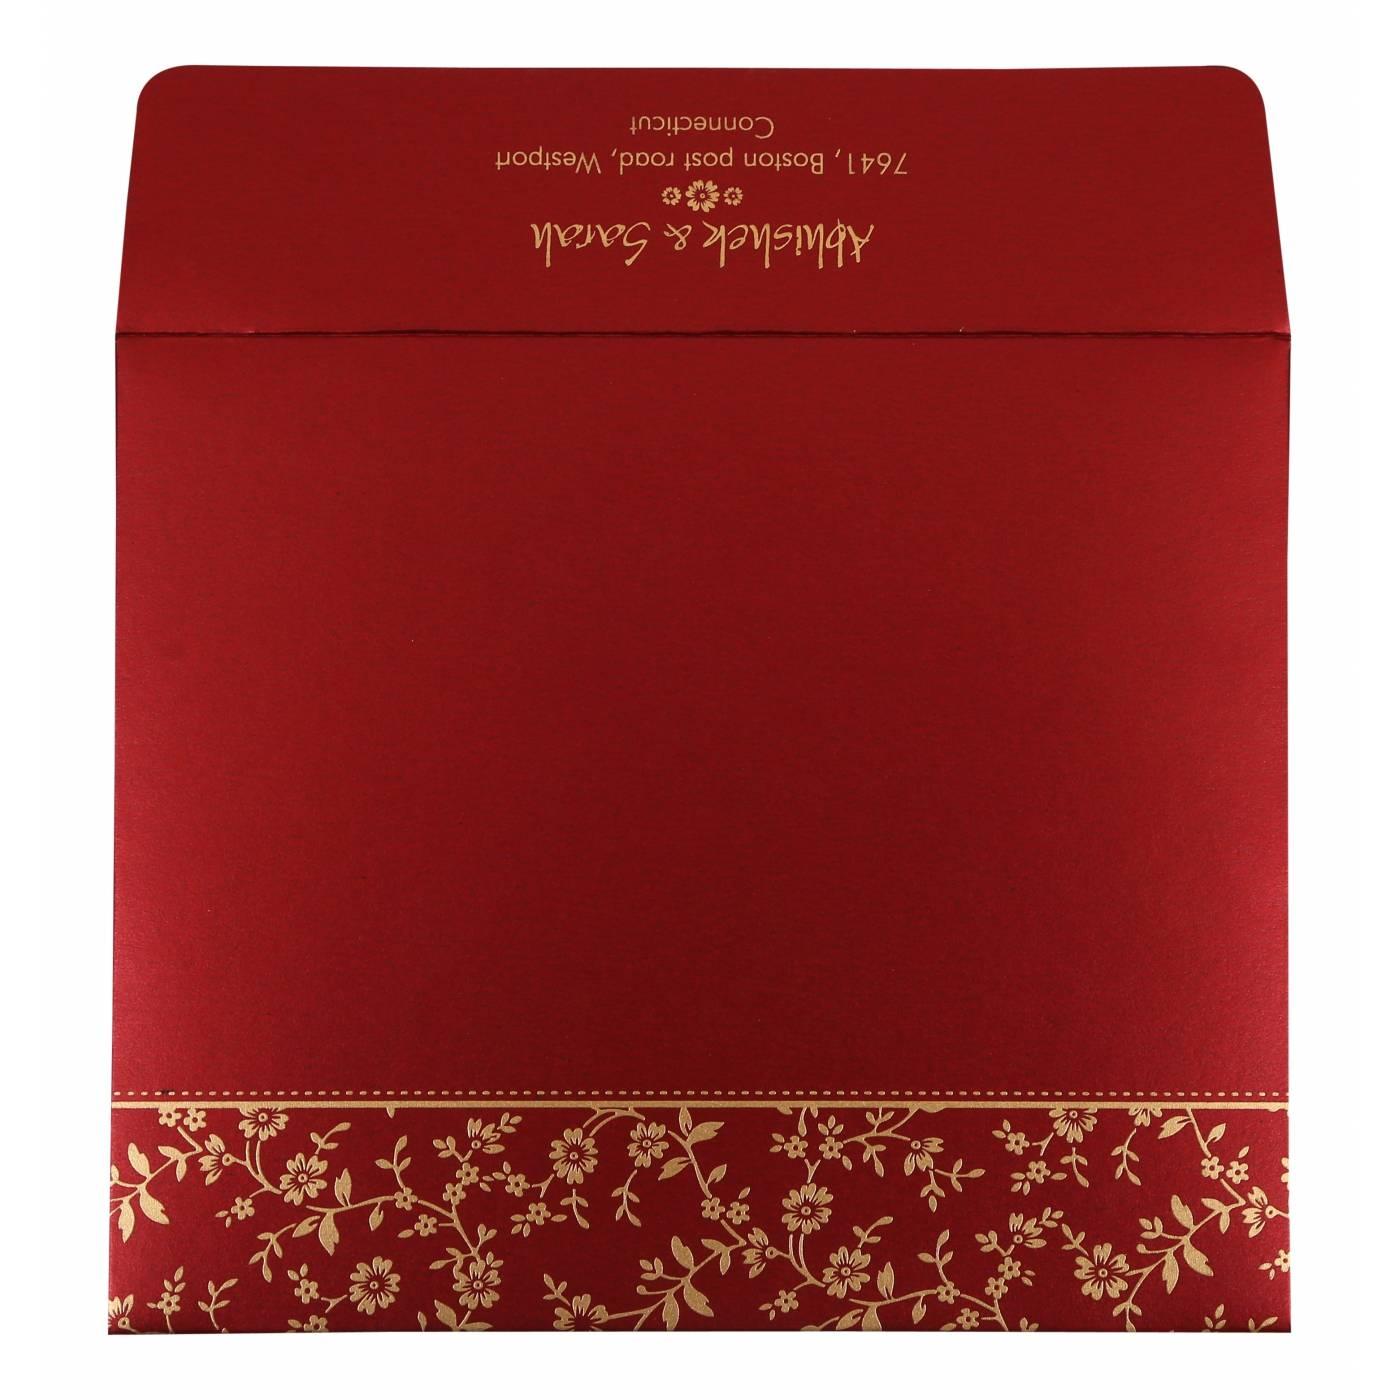 WINE RED SHIMMERY SCREEN PRINTED WEDDING INVITATION : CIN-804B - IndianWeddingCards